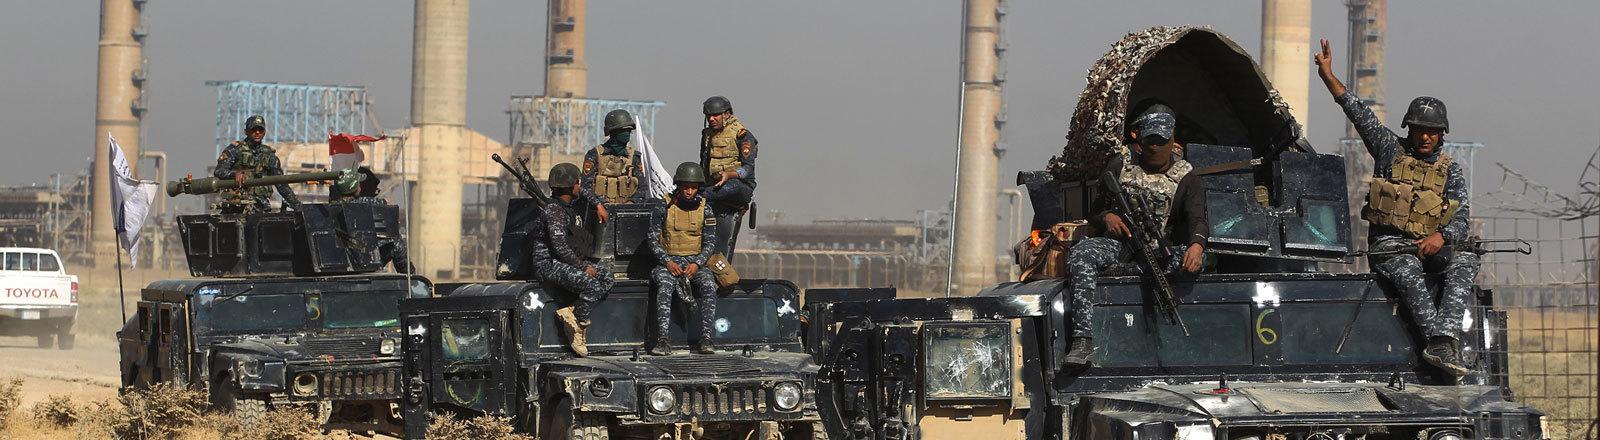 Irakische Truppen bei Kirkuk